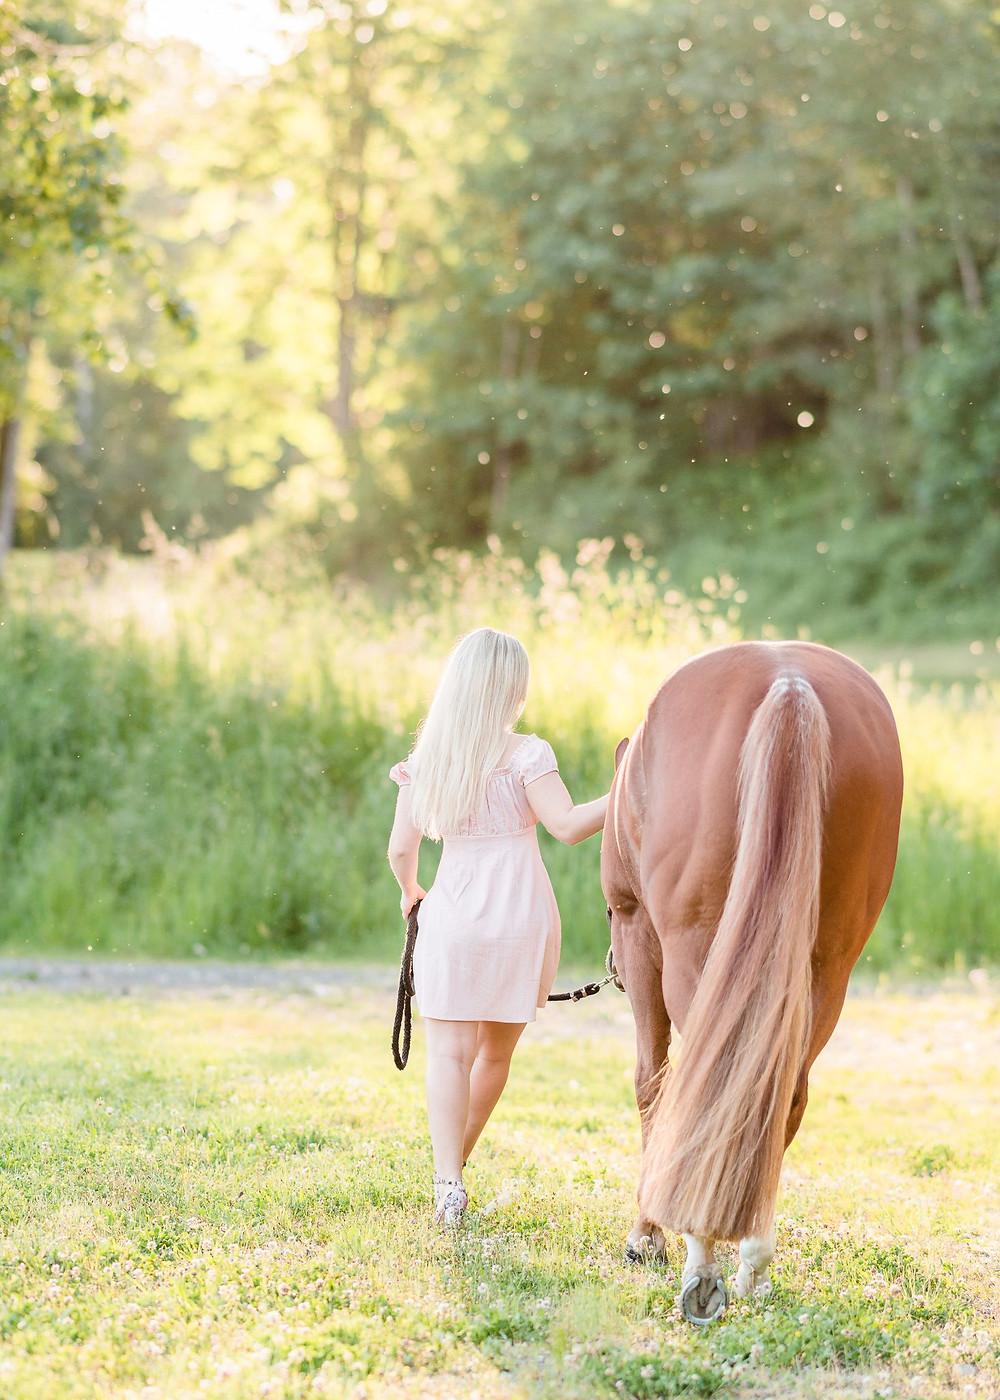 Caitlin & Ava walking away from the camera